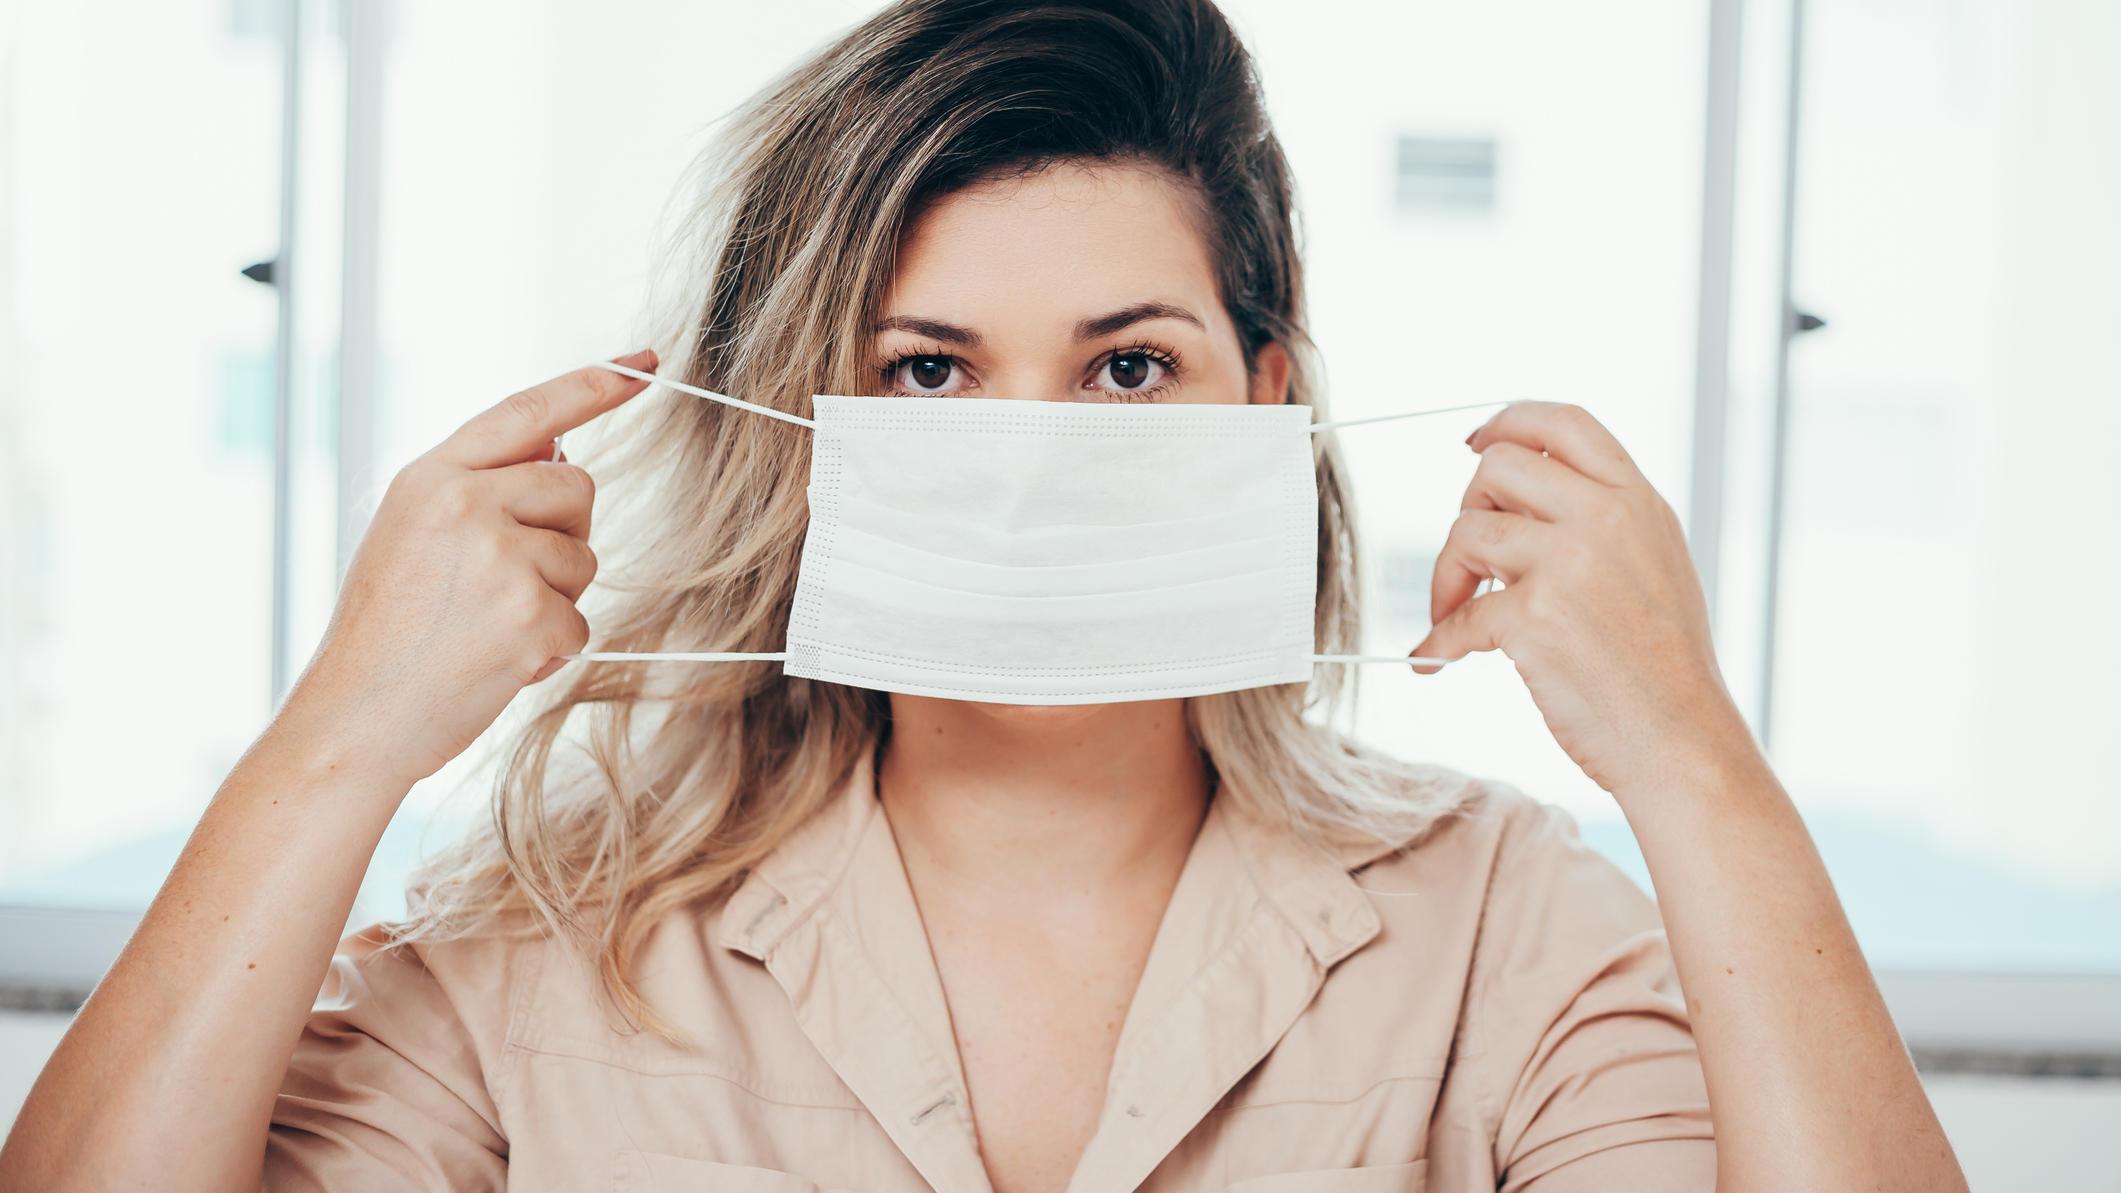 Erste Gesichtsmaske tötet Coronaviren binnen Minuten